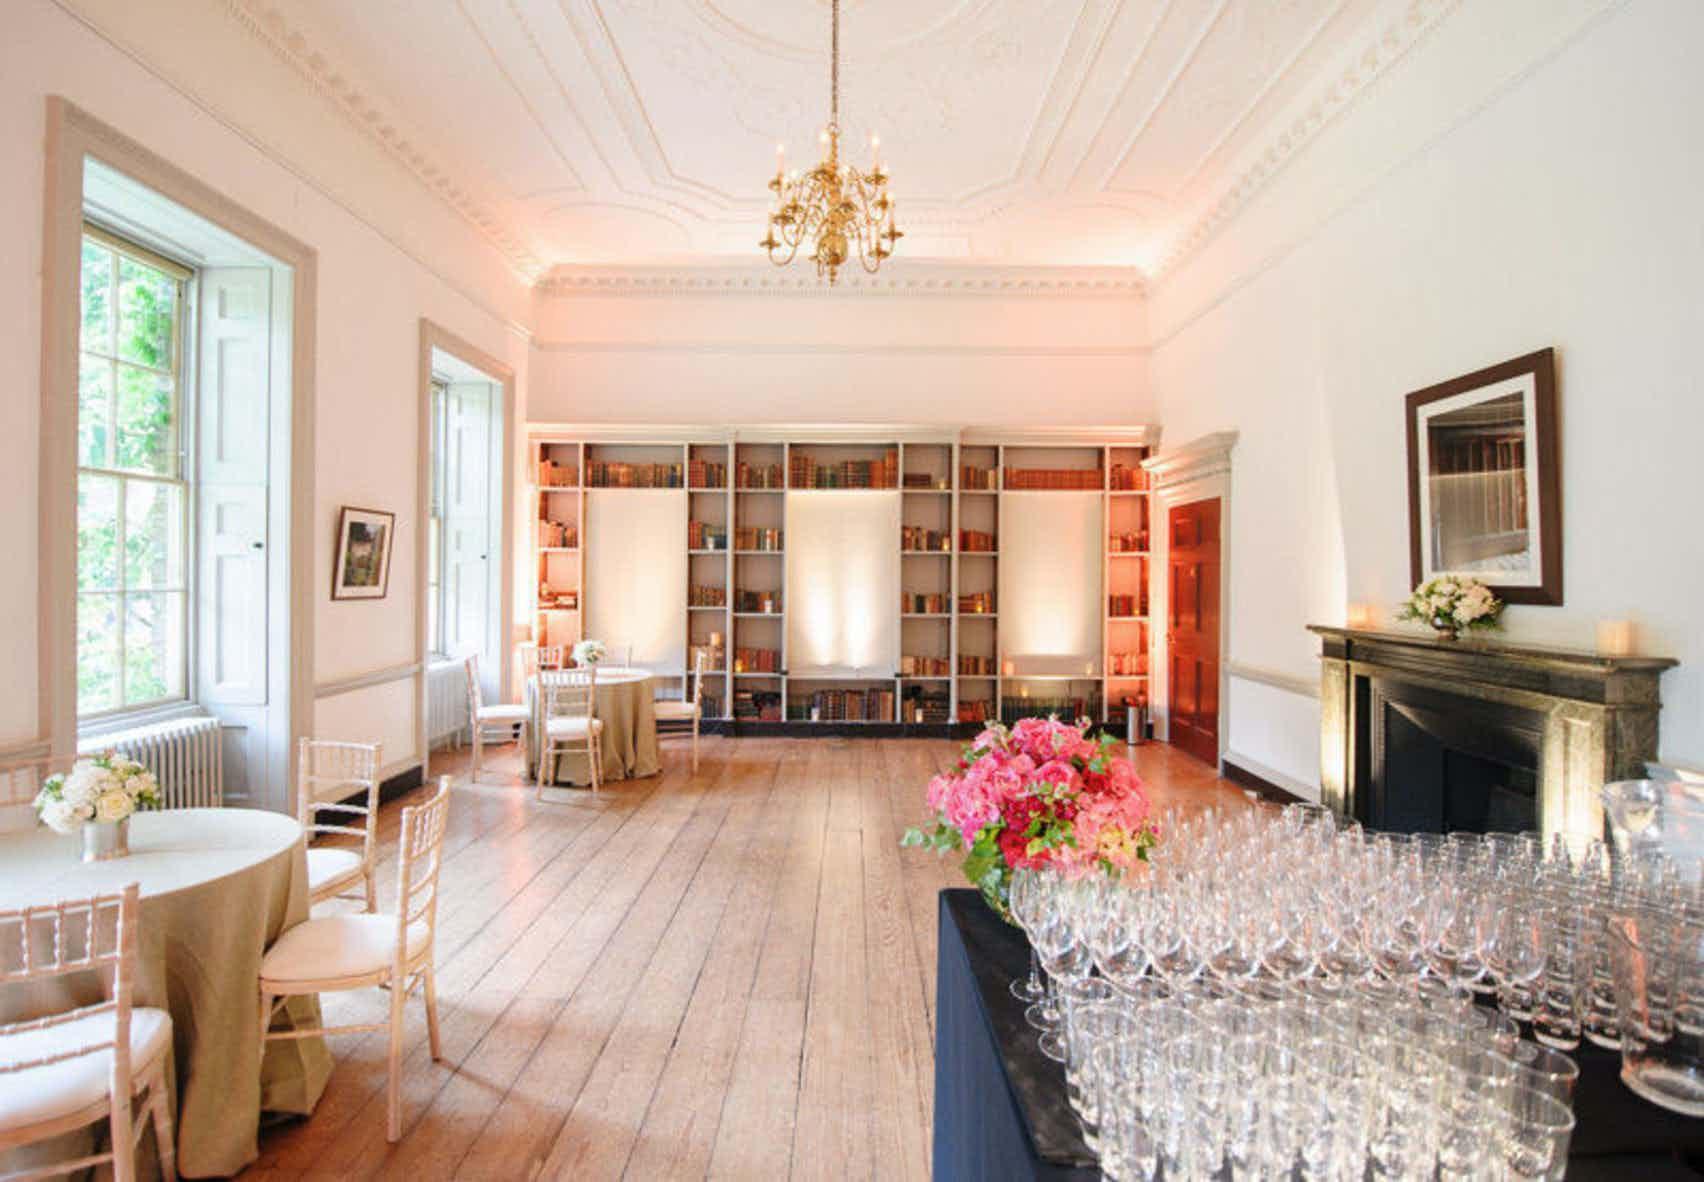 Bishops Terricks Drawing & Dining Room, Fulham Palace